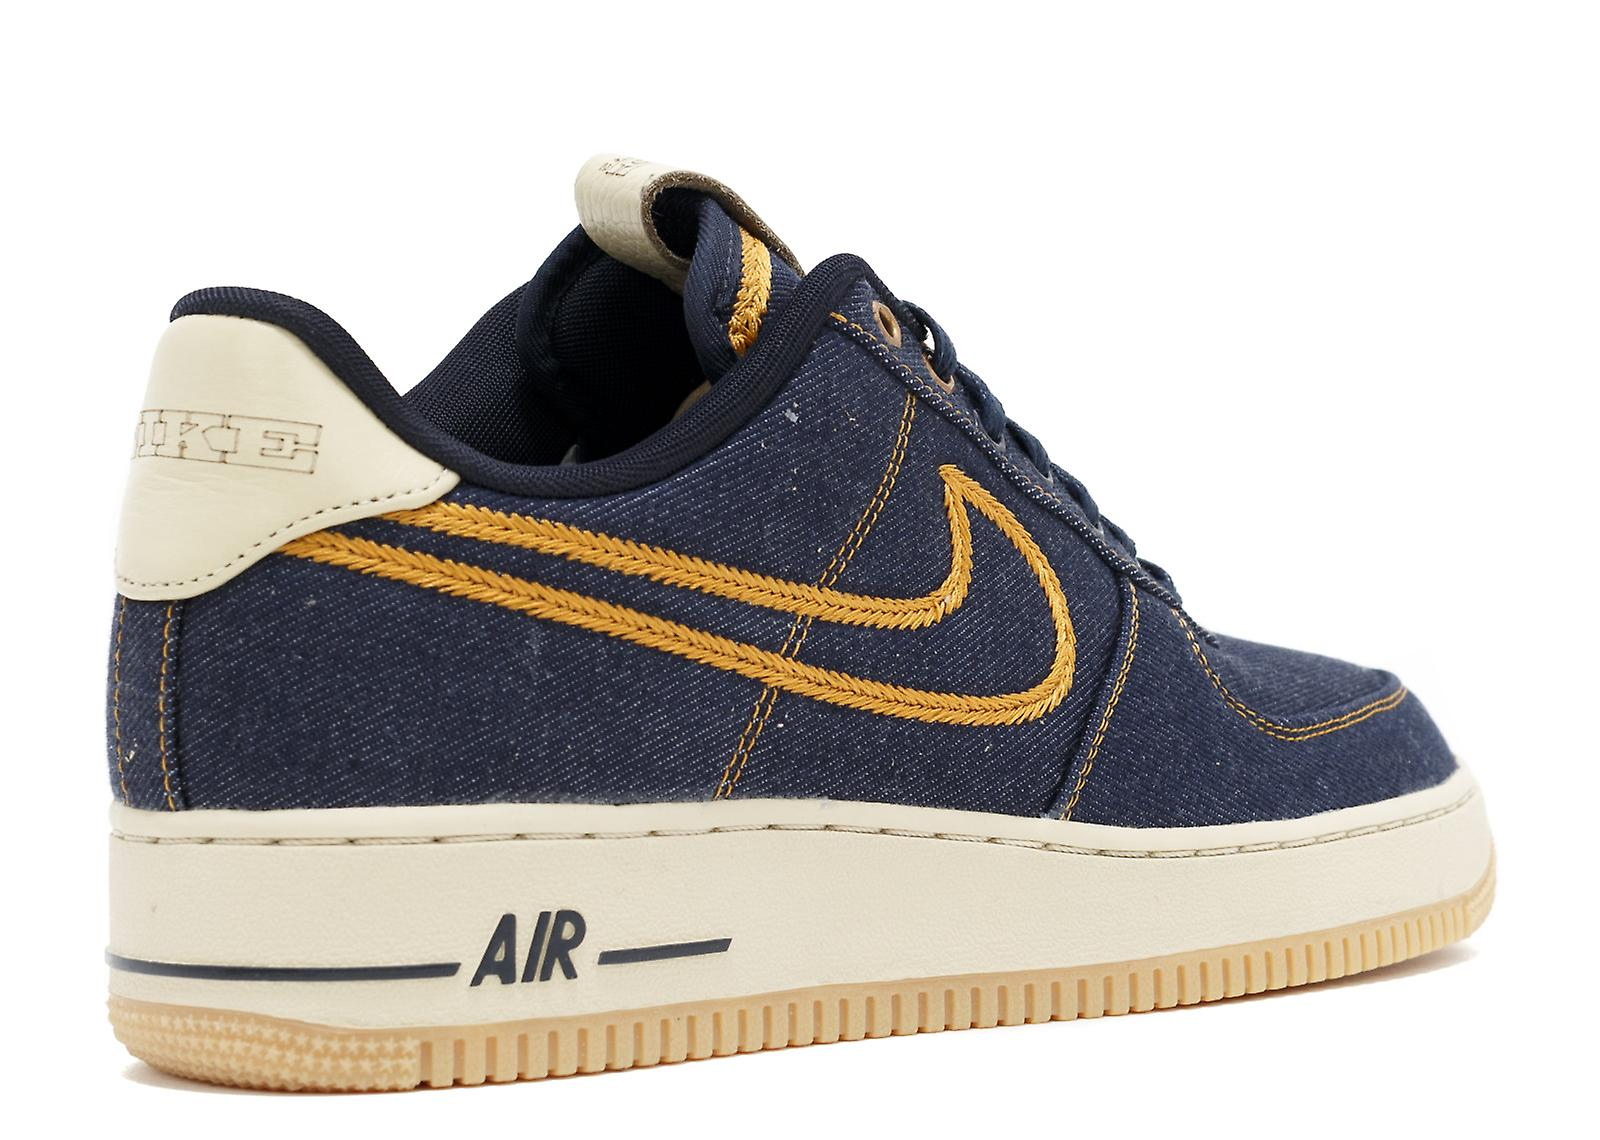 "Air Force 1 Low Premium ""Denim"" - 318775 - 404 - Schuhe"